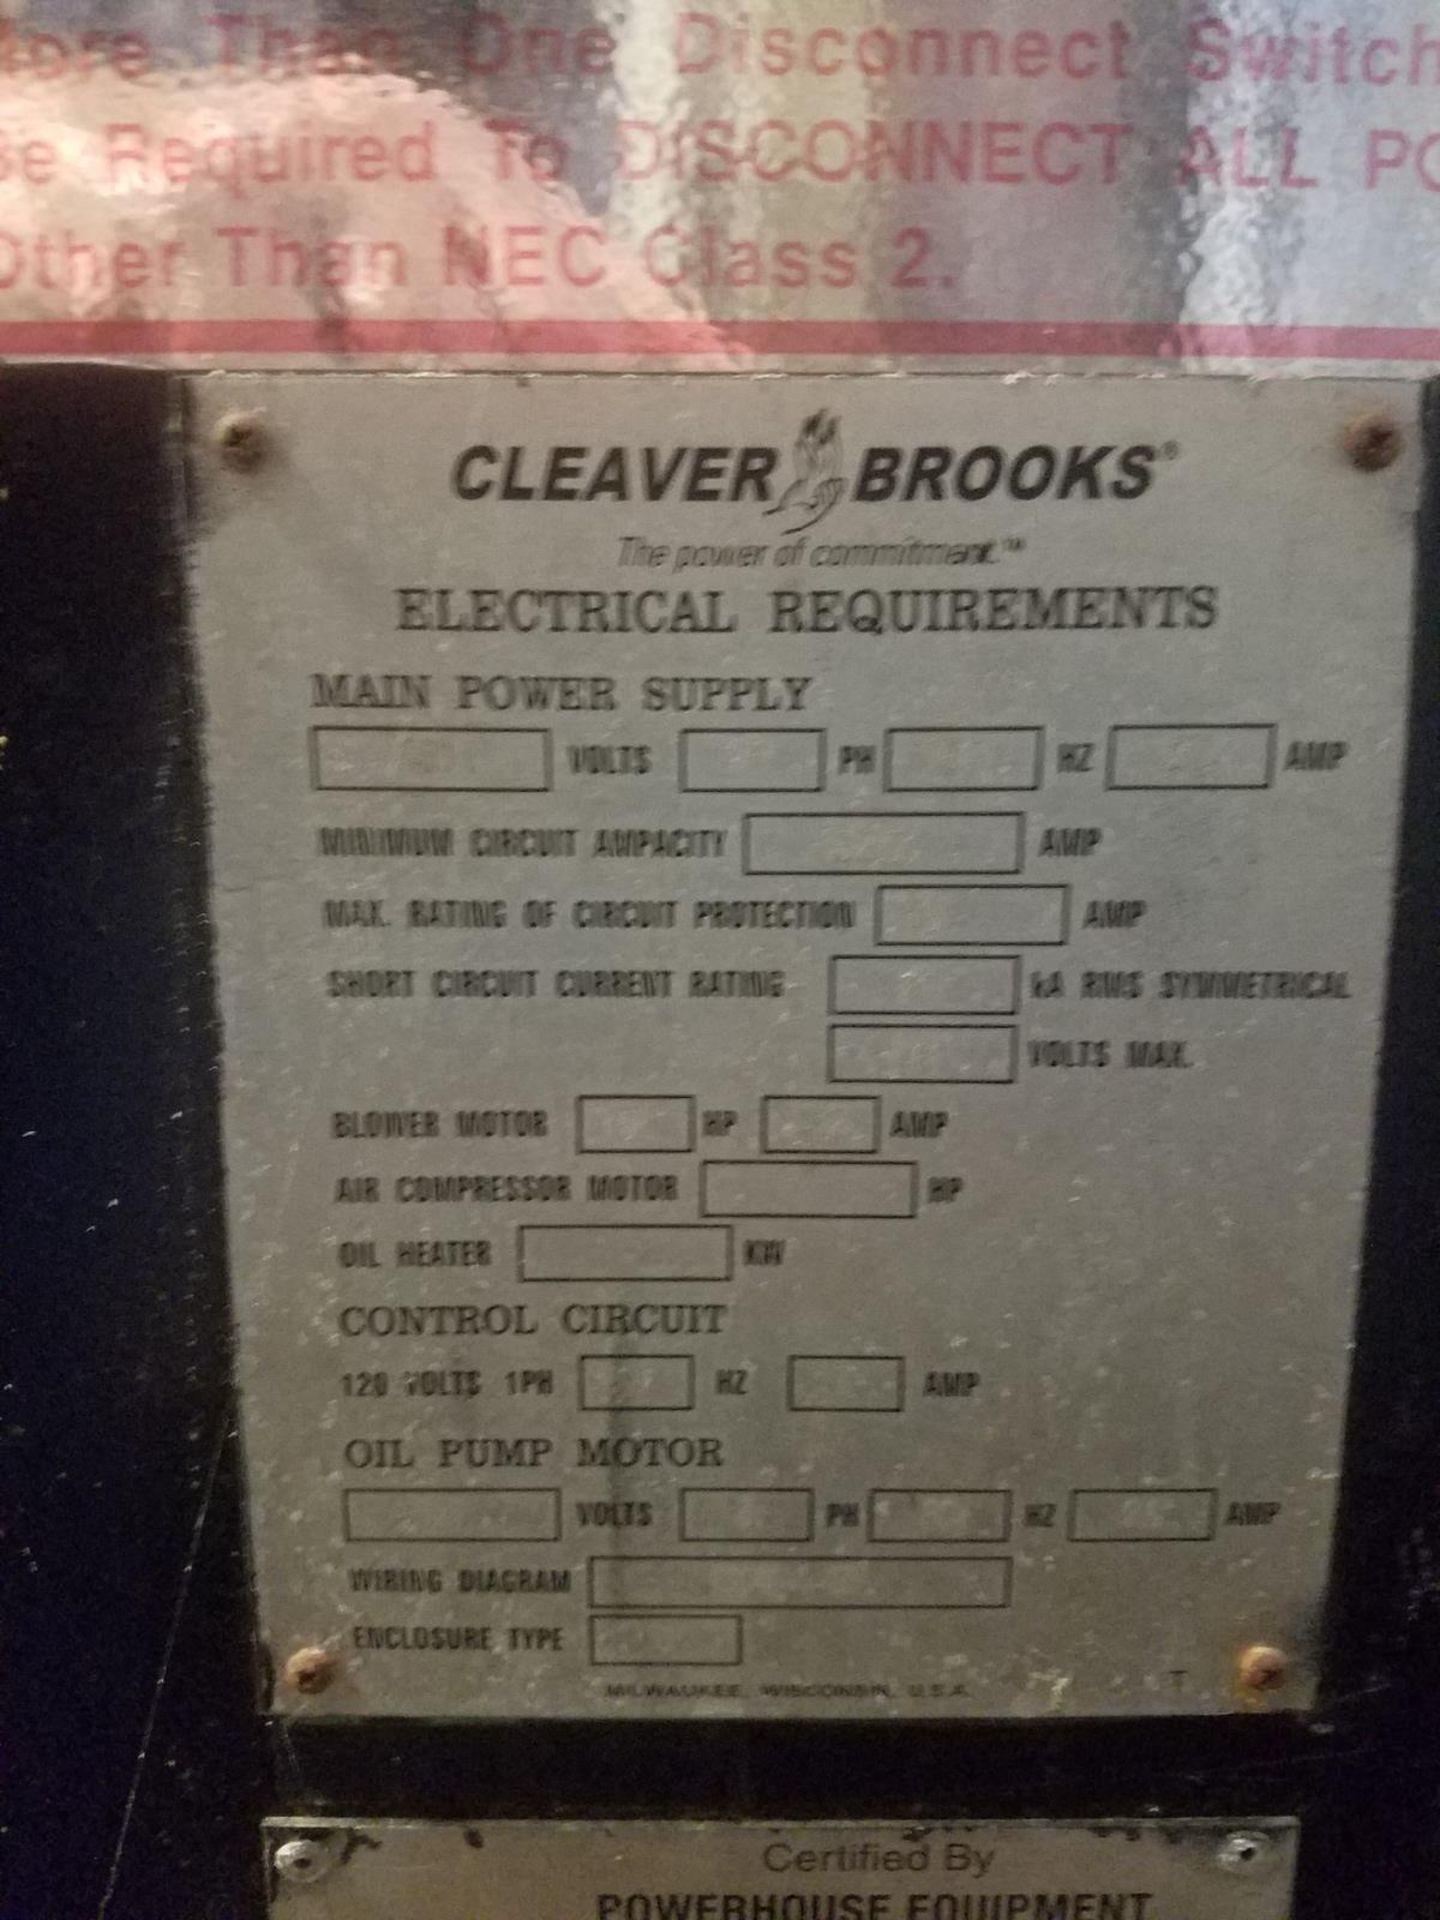 2009 (Rebuilt 2016) 250 HP Cleaver Brooks Boiler, 8.9 mmBTU, M# CB-200-250S-250, | Rig Fee: $5000 - Image 5 of 7